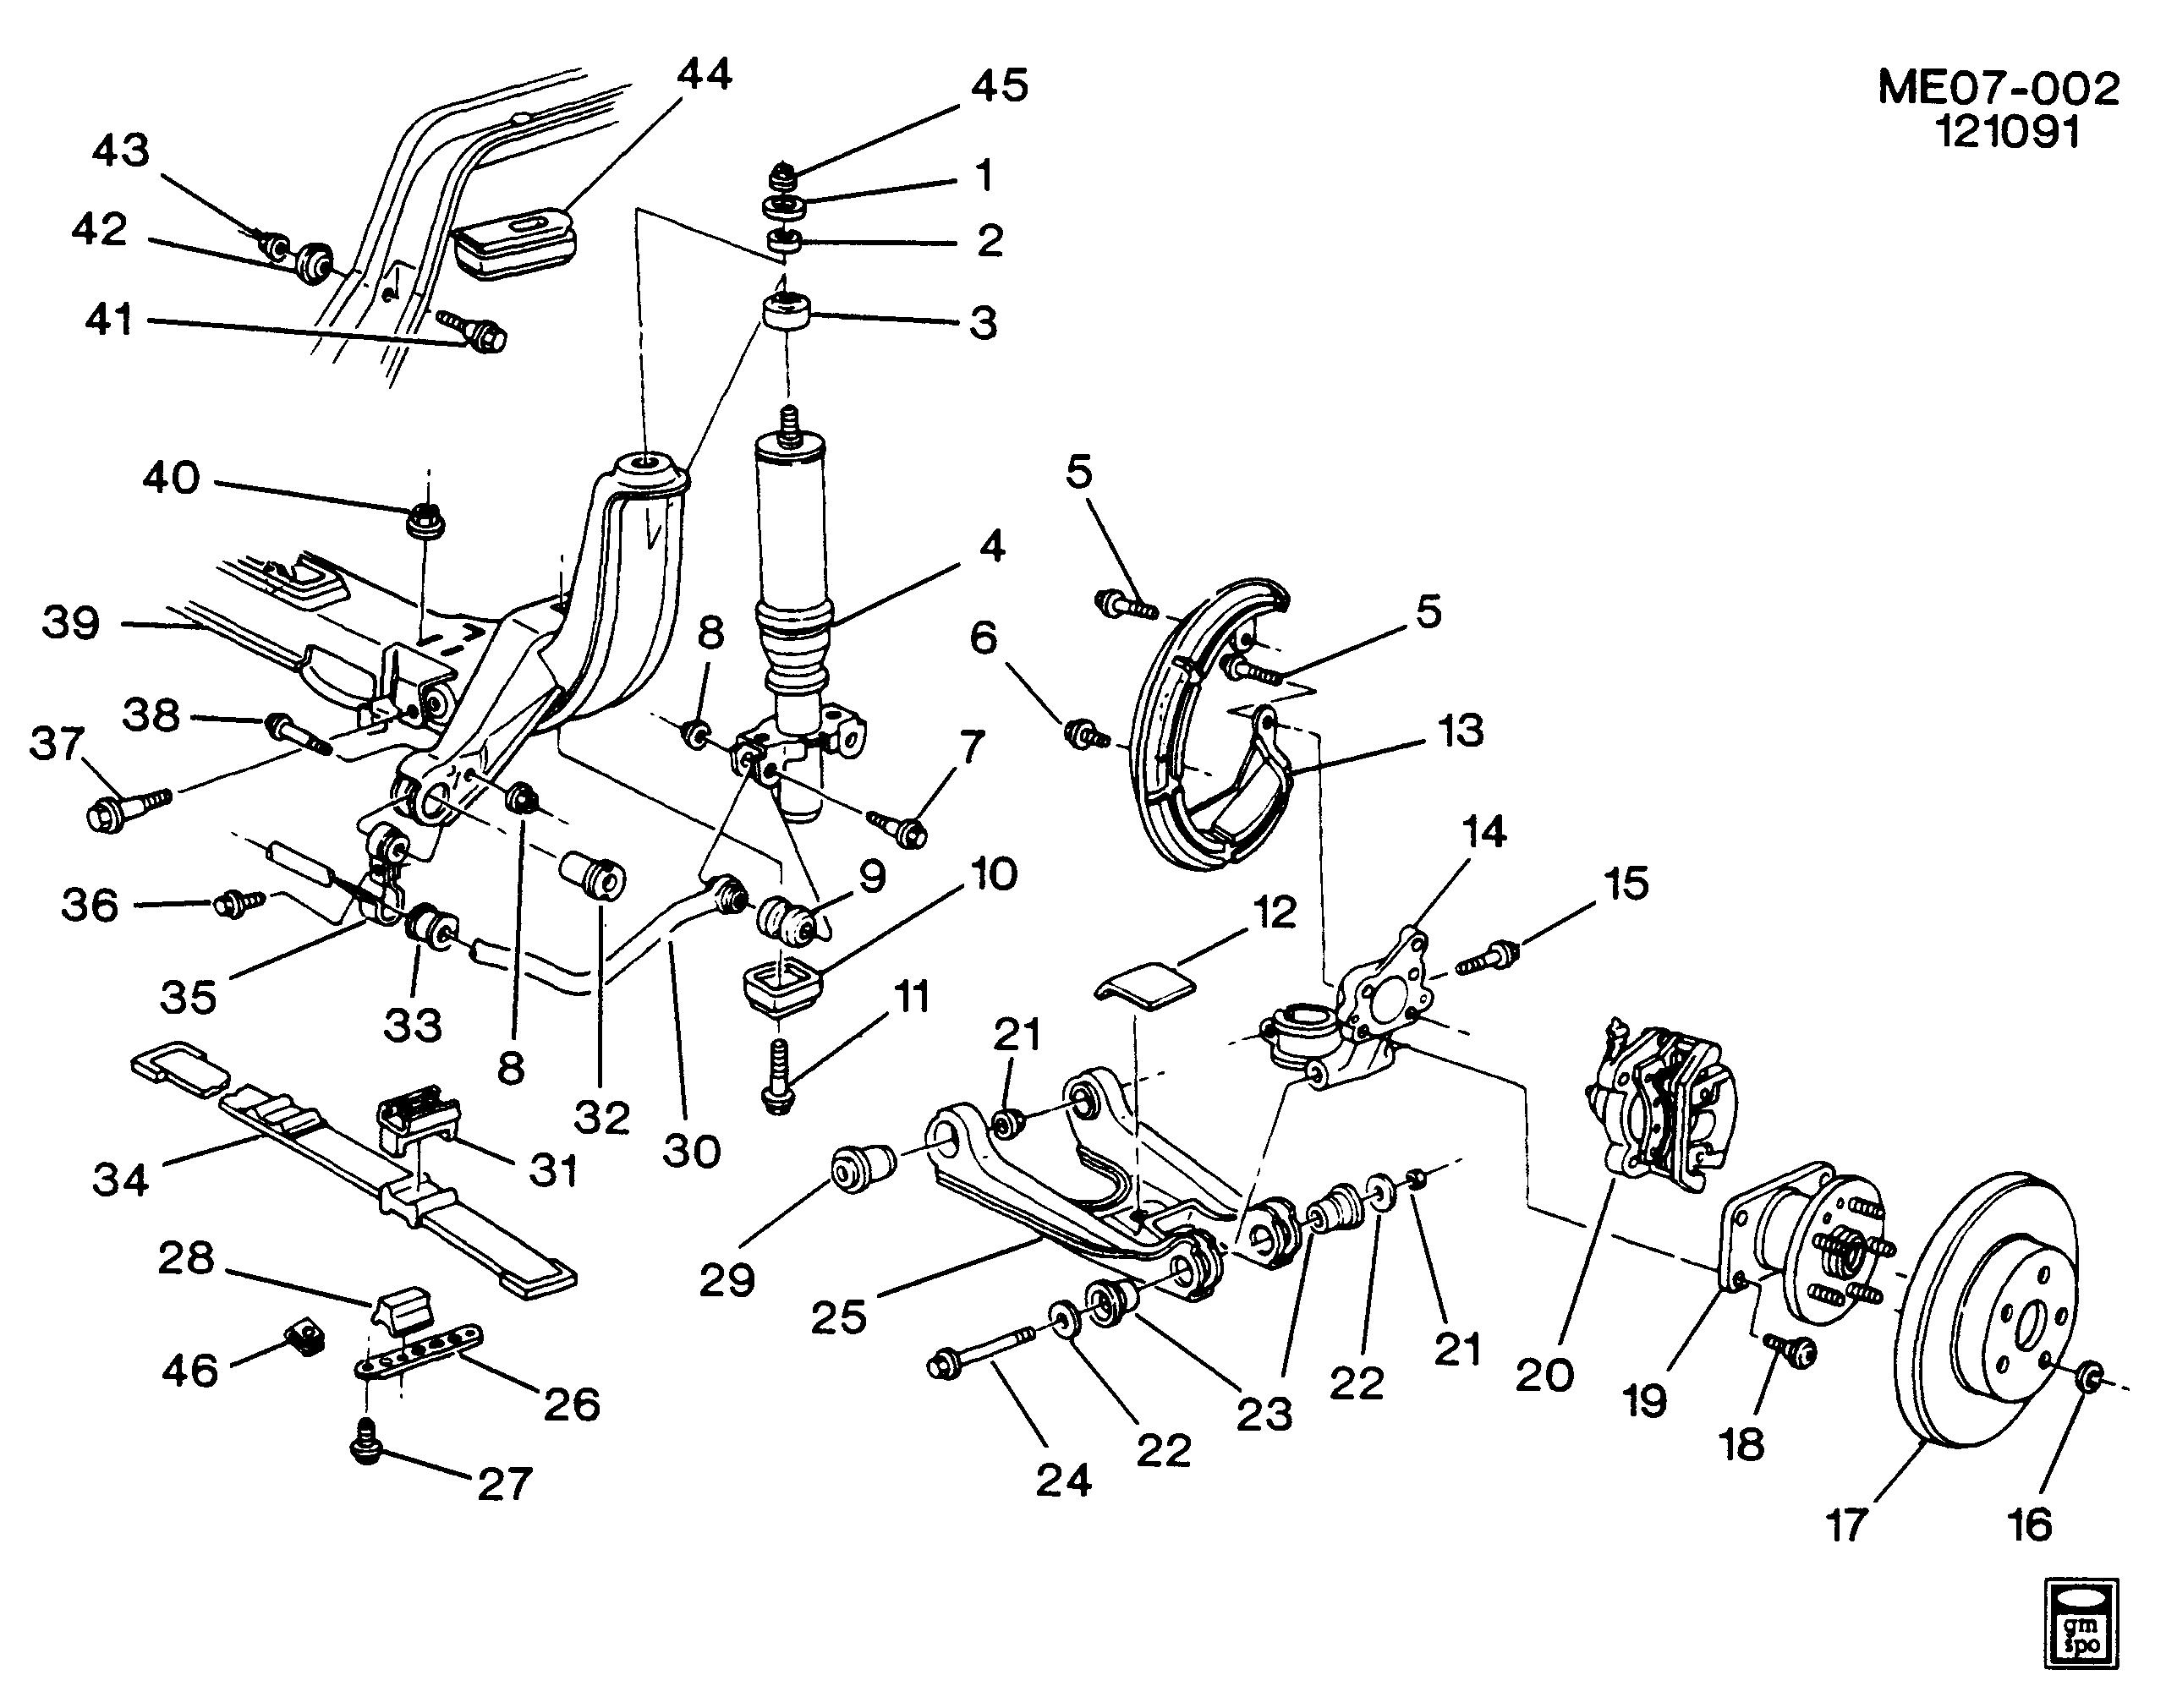 1990 Buick Reatta Suspension Diagram Electrical Wiring Diagrams Schematic E Rear U003e Epc Online Nemiga Com Porsche 356